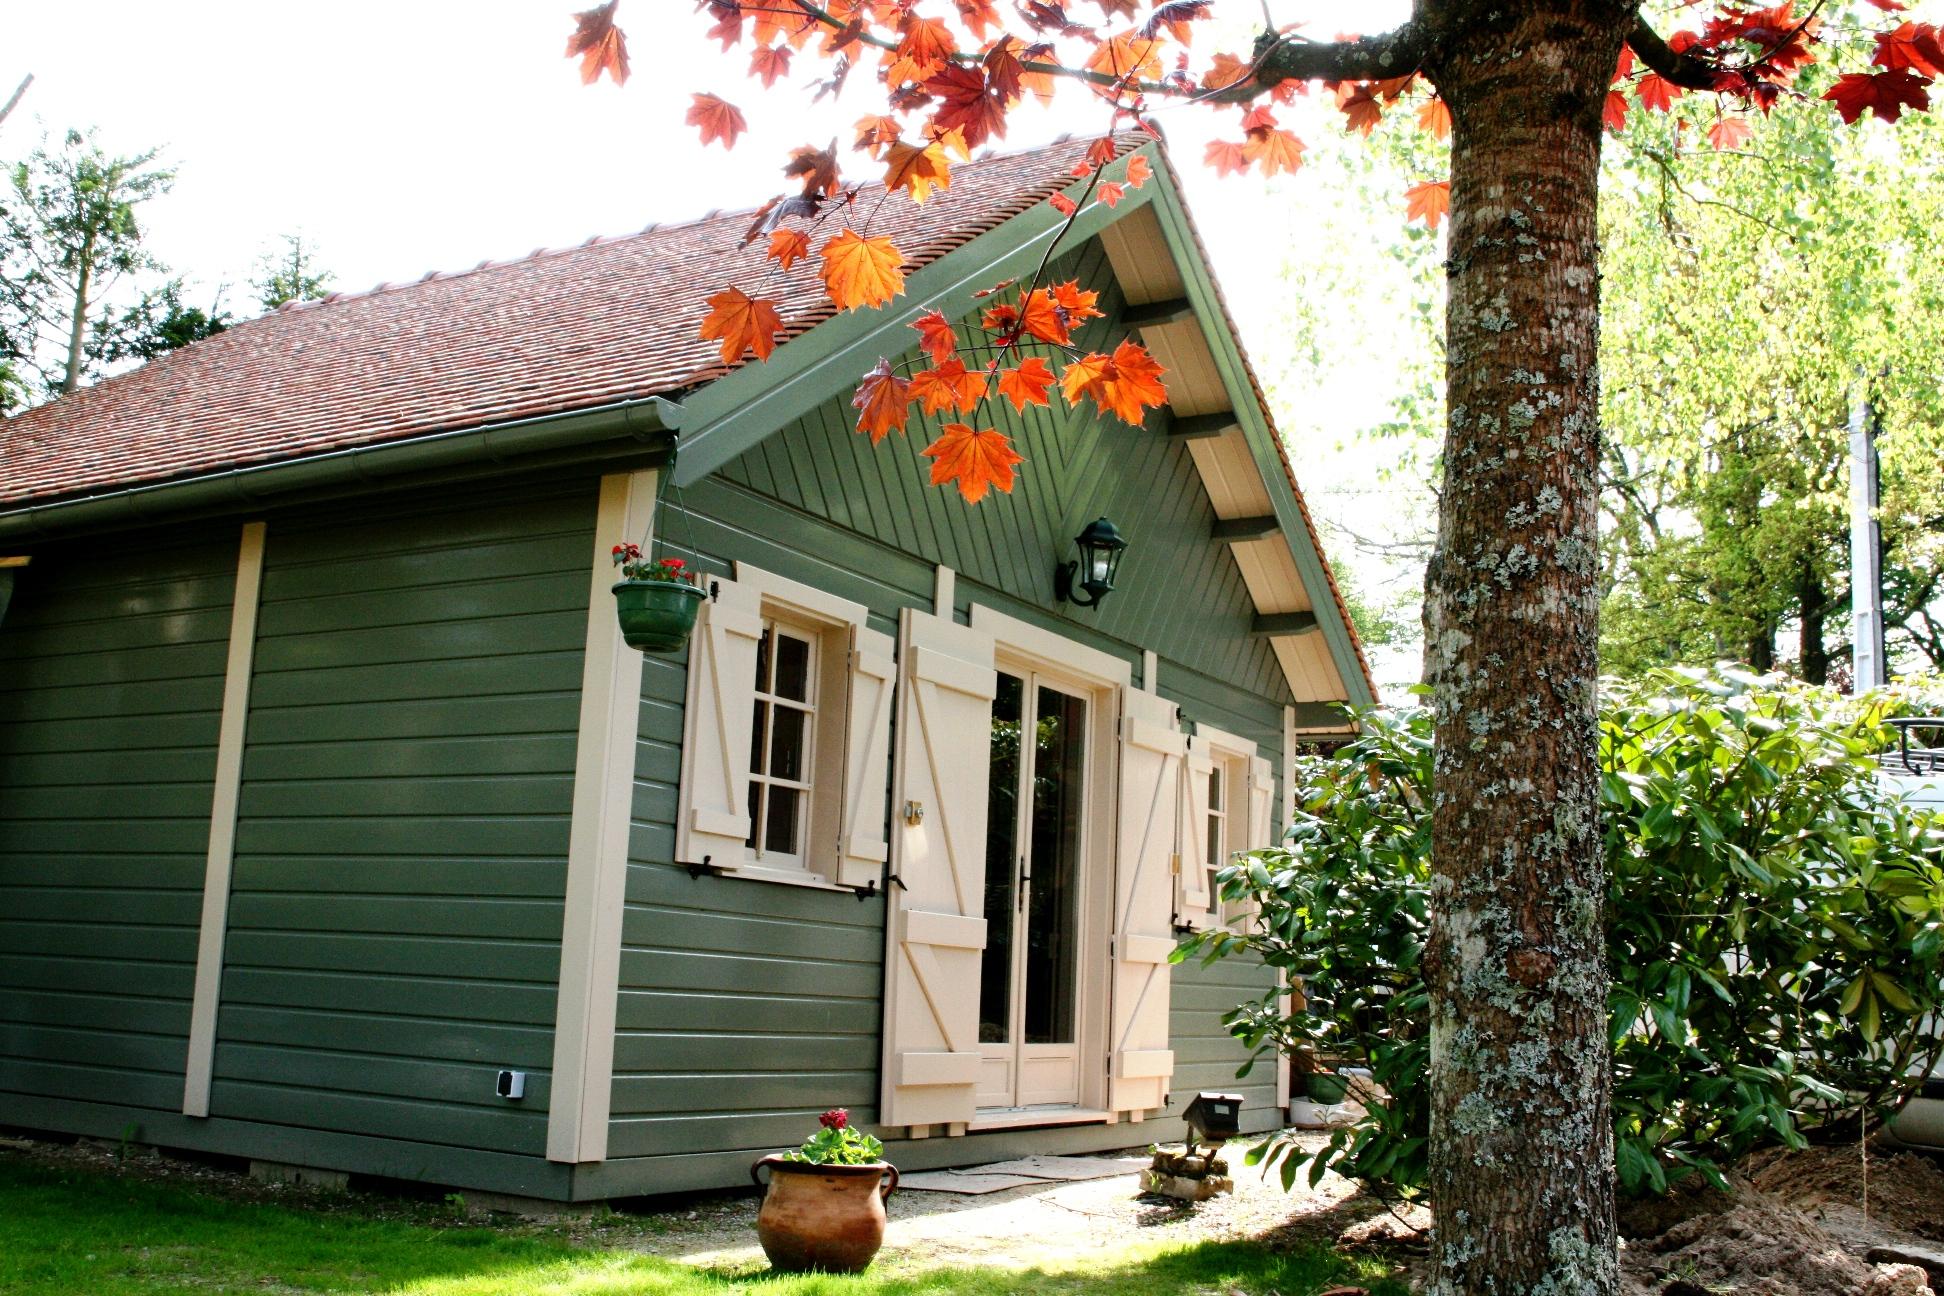 Cerisier Bois Franc : Cerisier : abris de jardin en boisCerisier : abris de jardin en bois